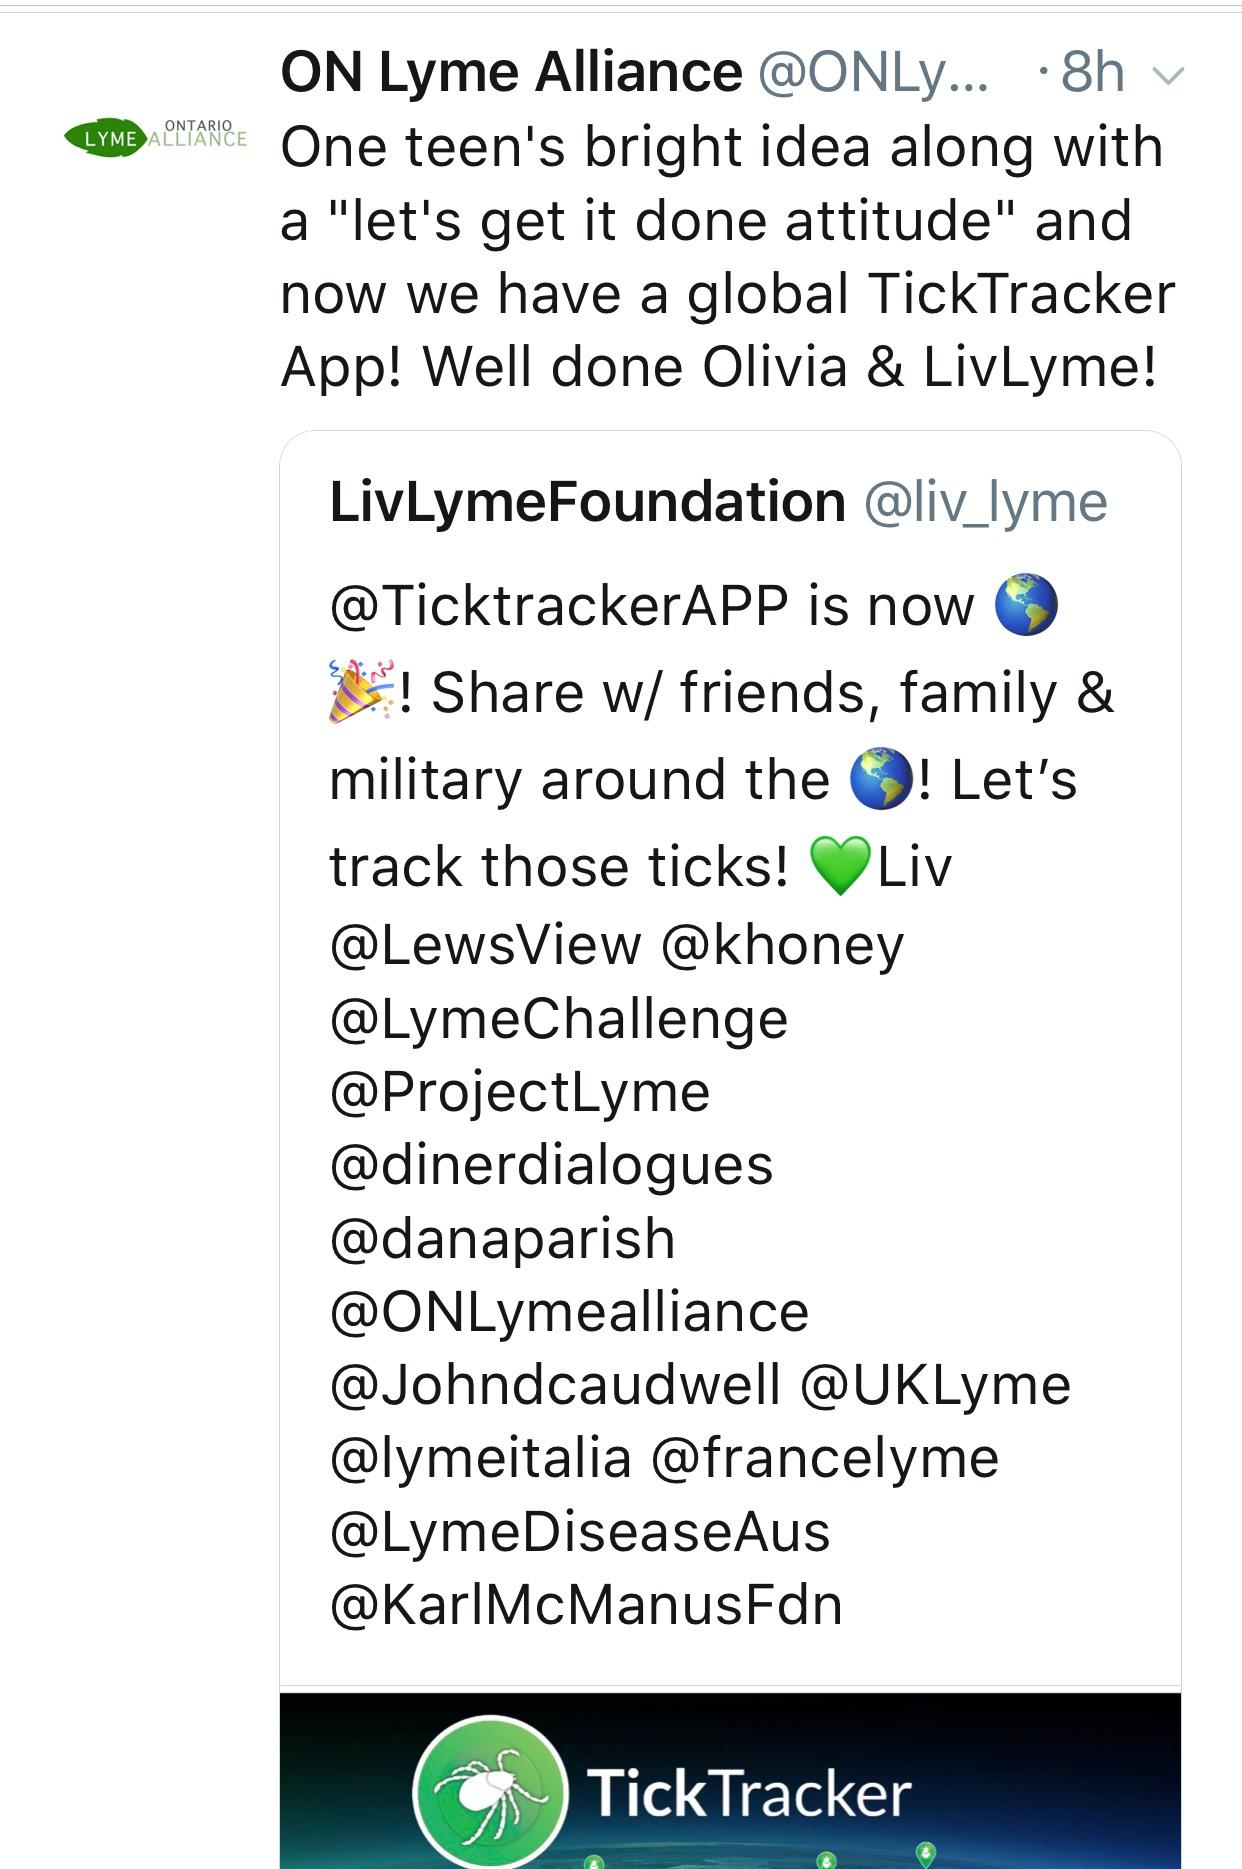 TickTracker_Ontario-Lyme-Alliance-Tweet_LivLymeFoundation